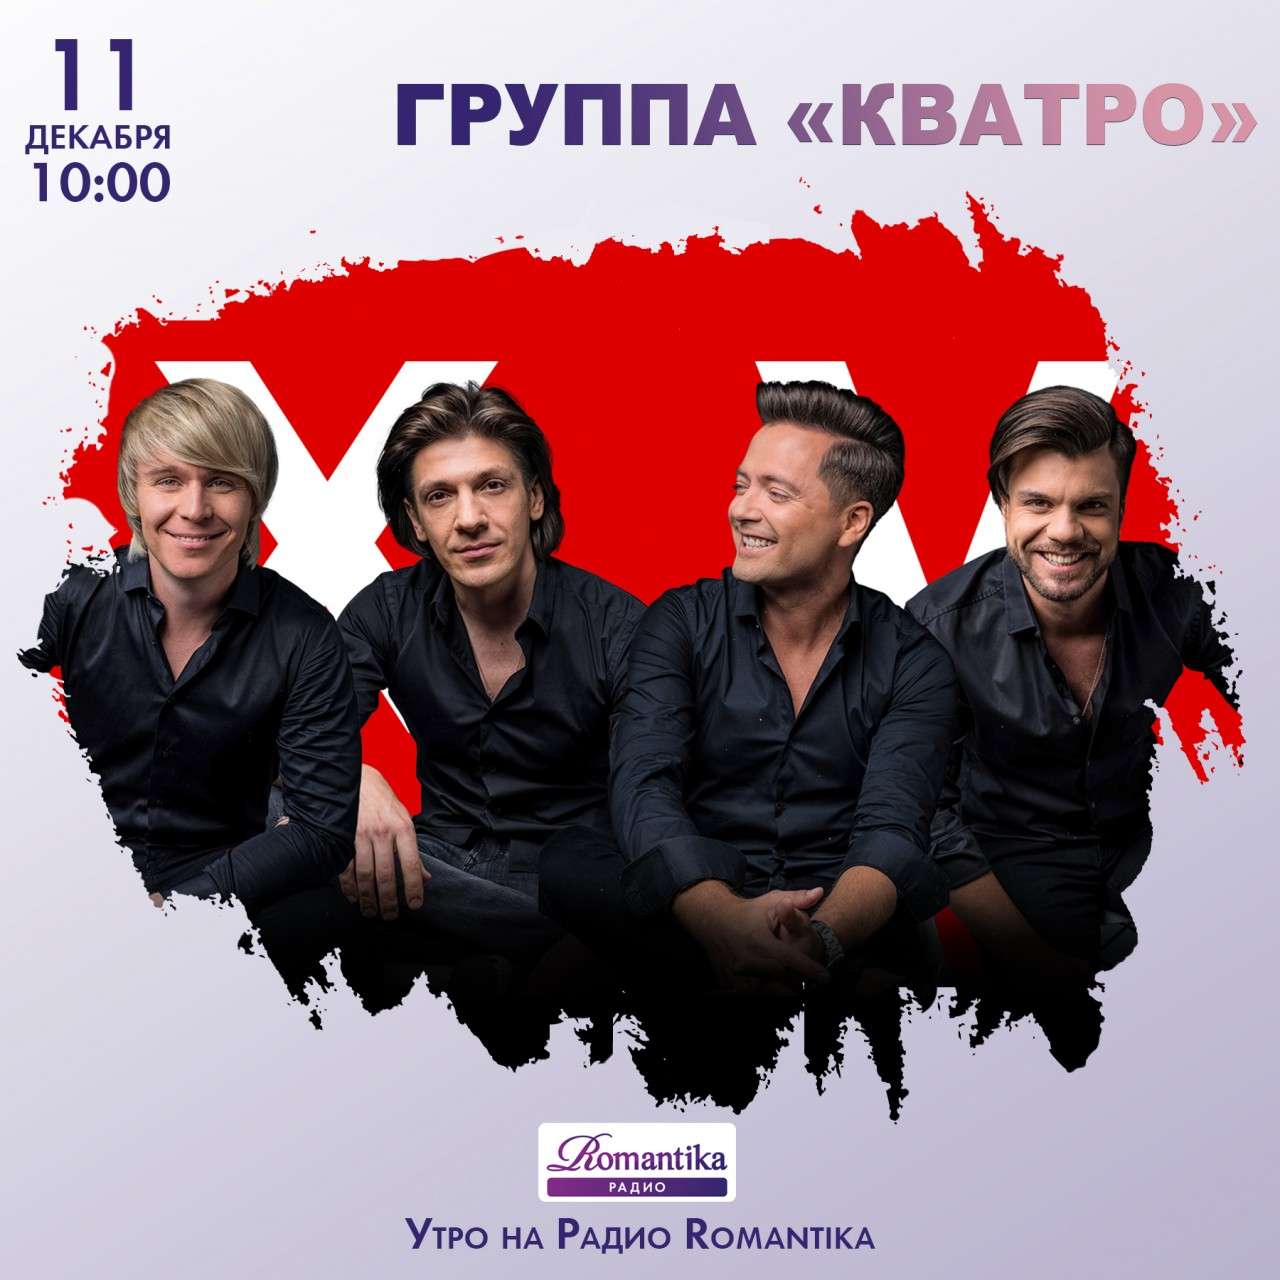 Радио Romantika: 11 декабря …